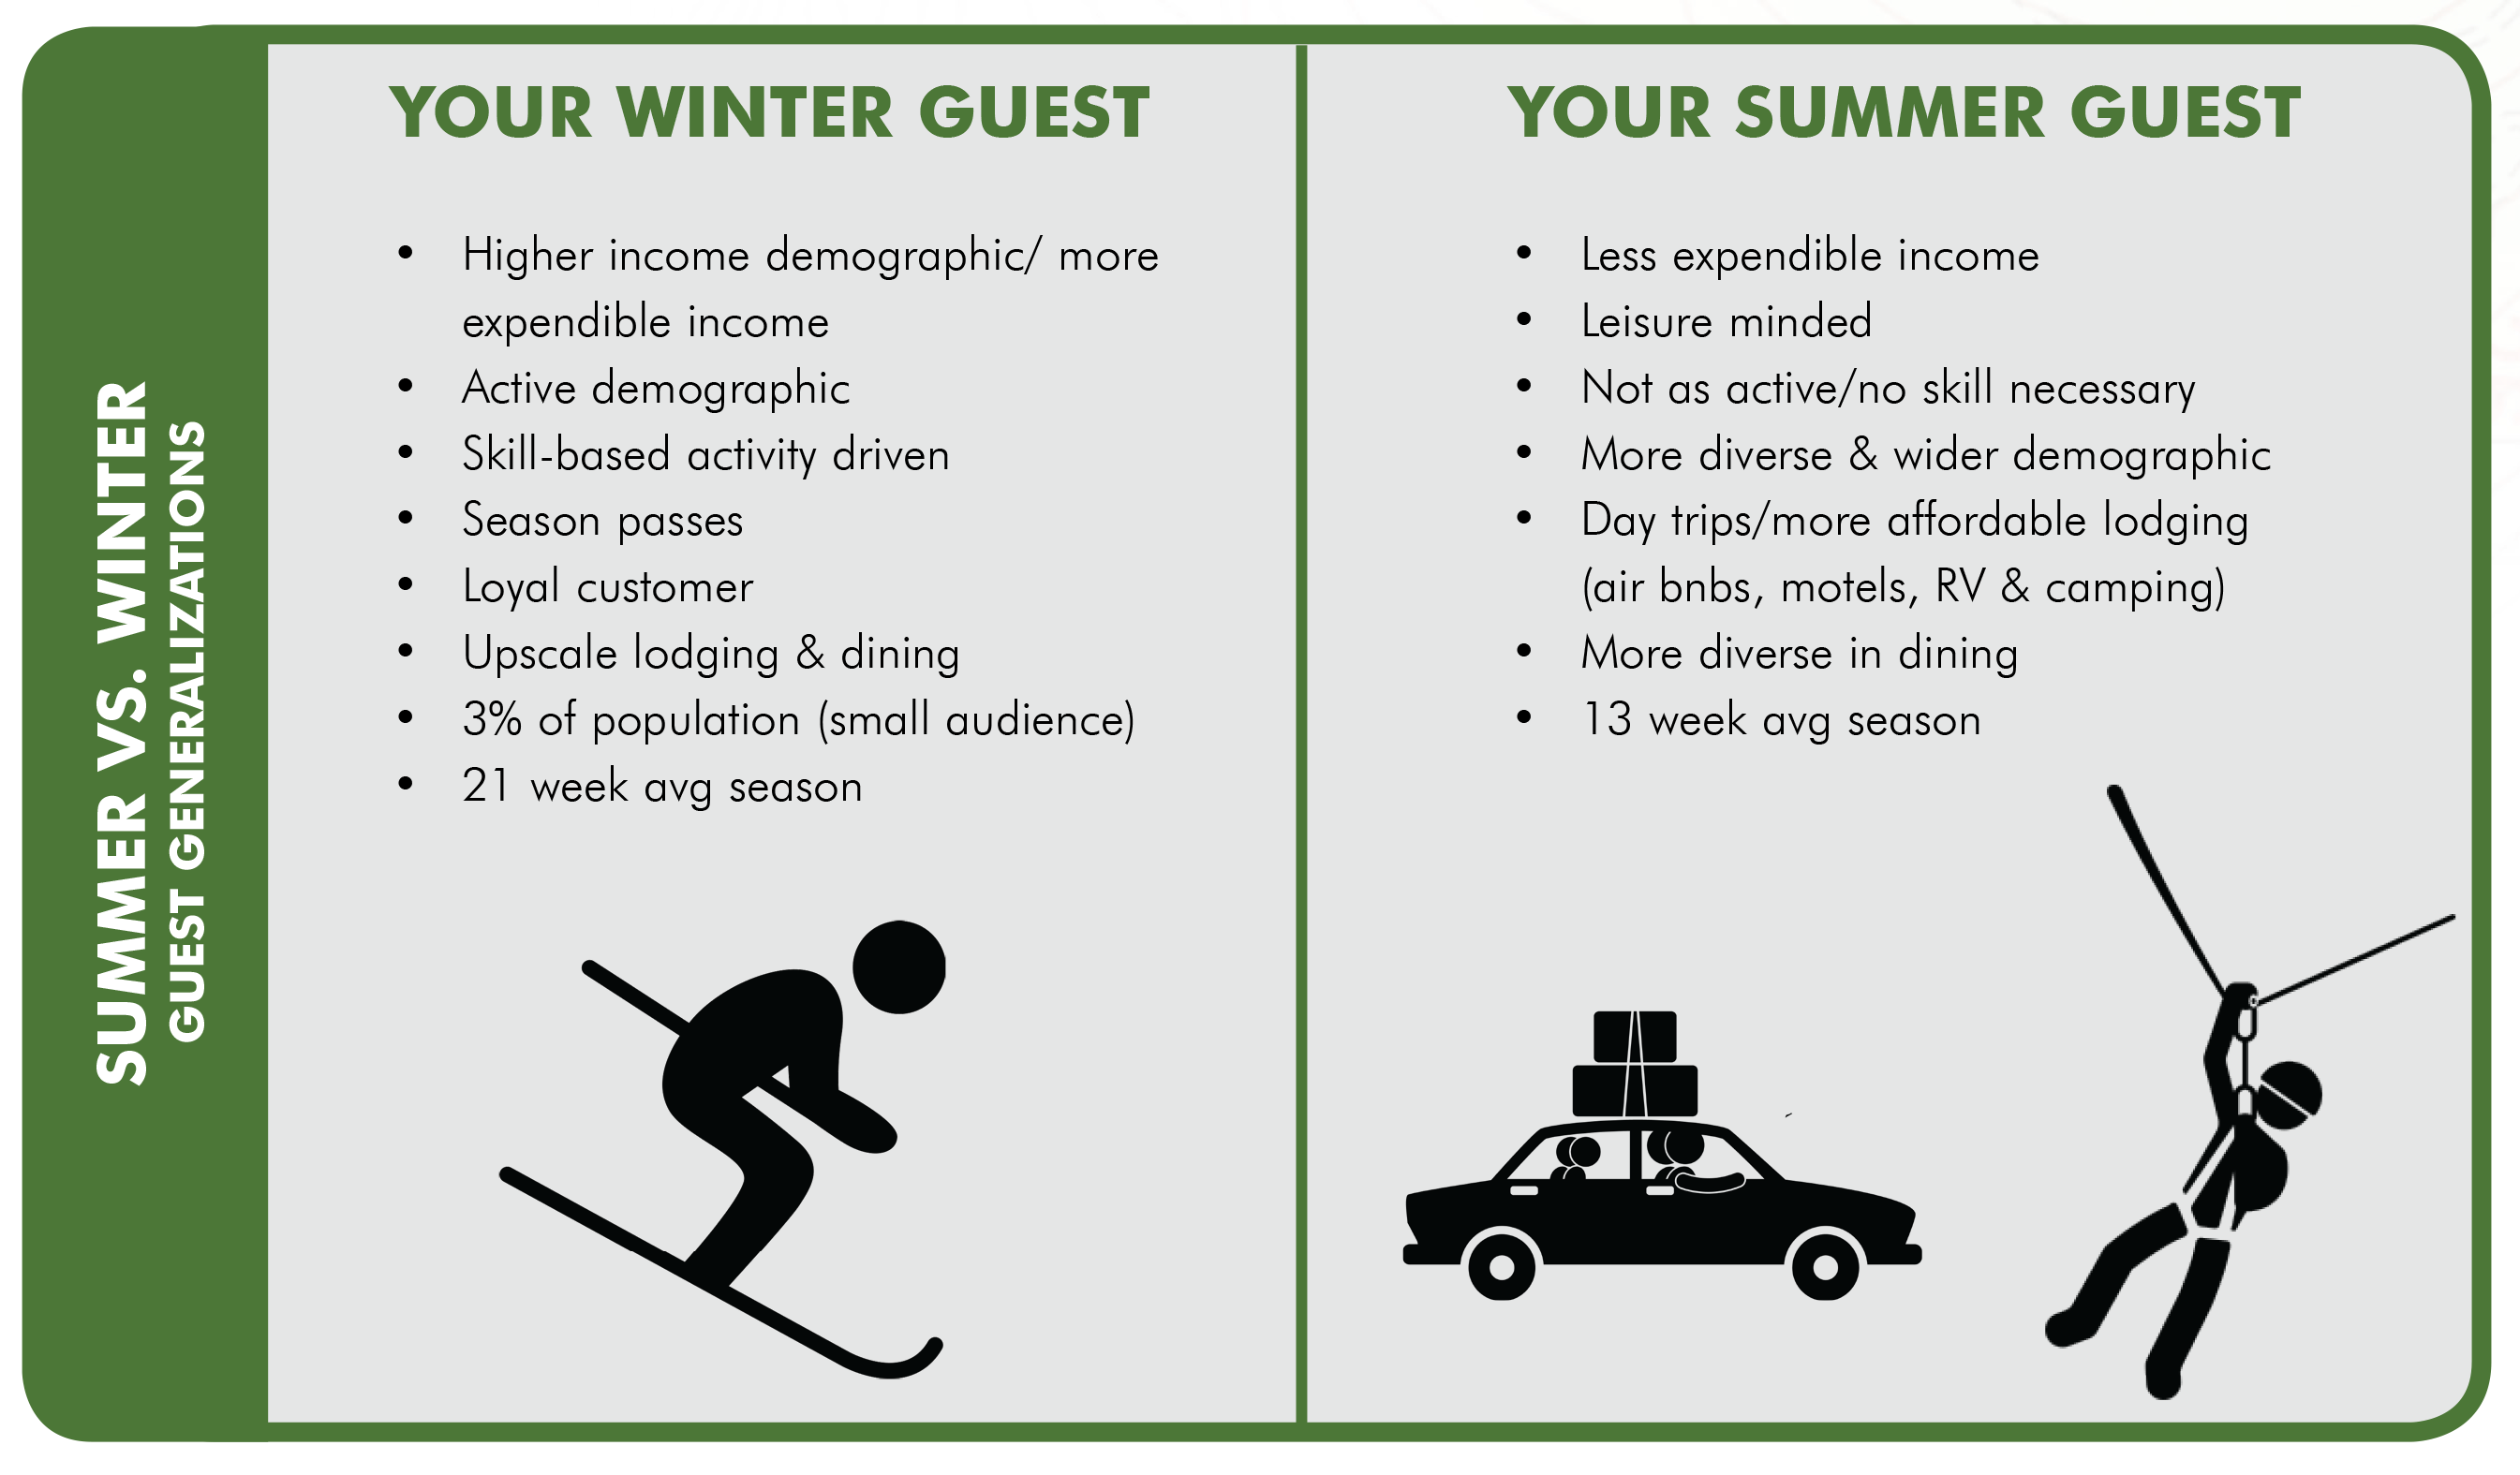 adg chart of summer vs winter guests